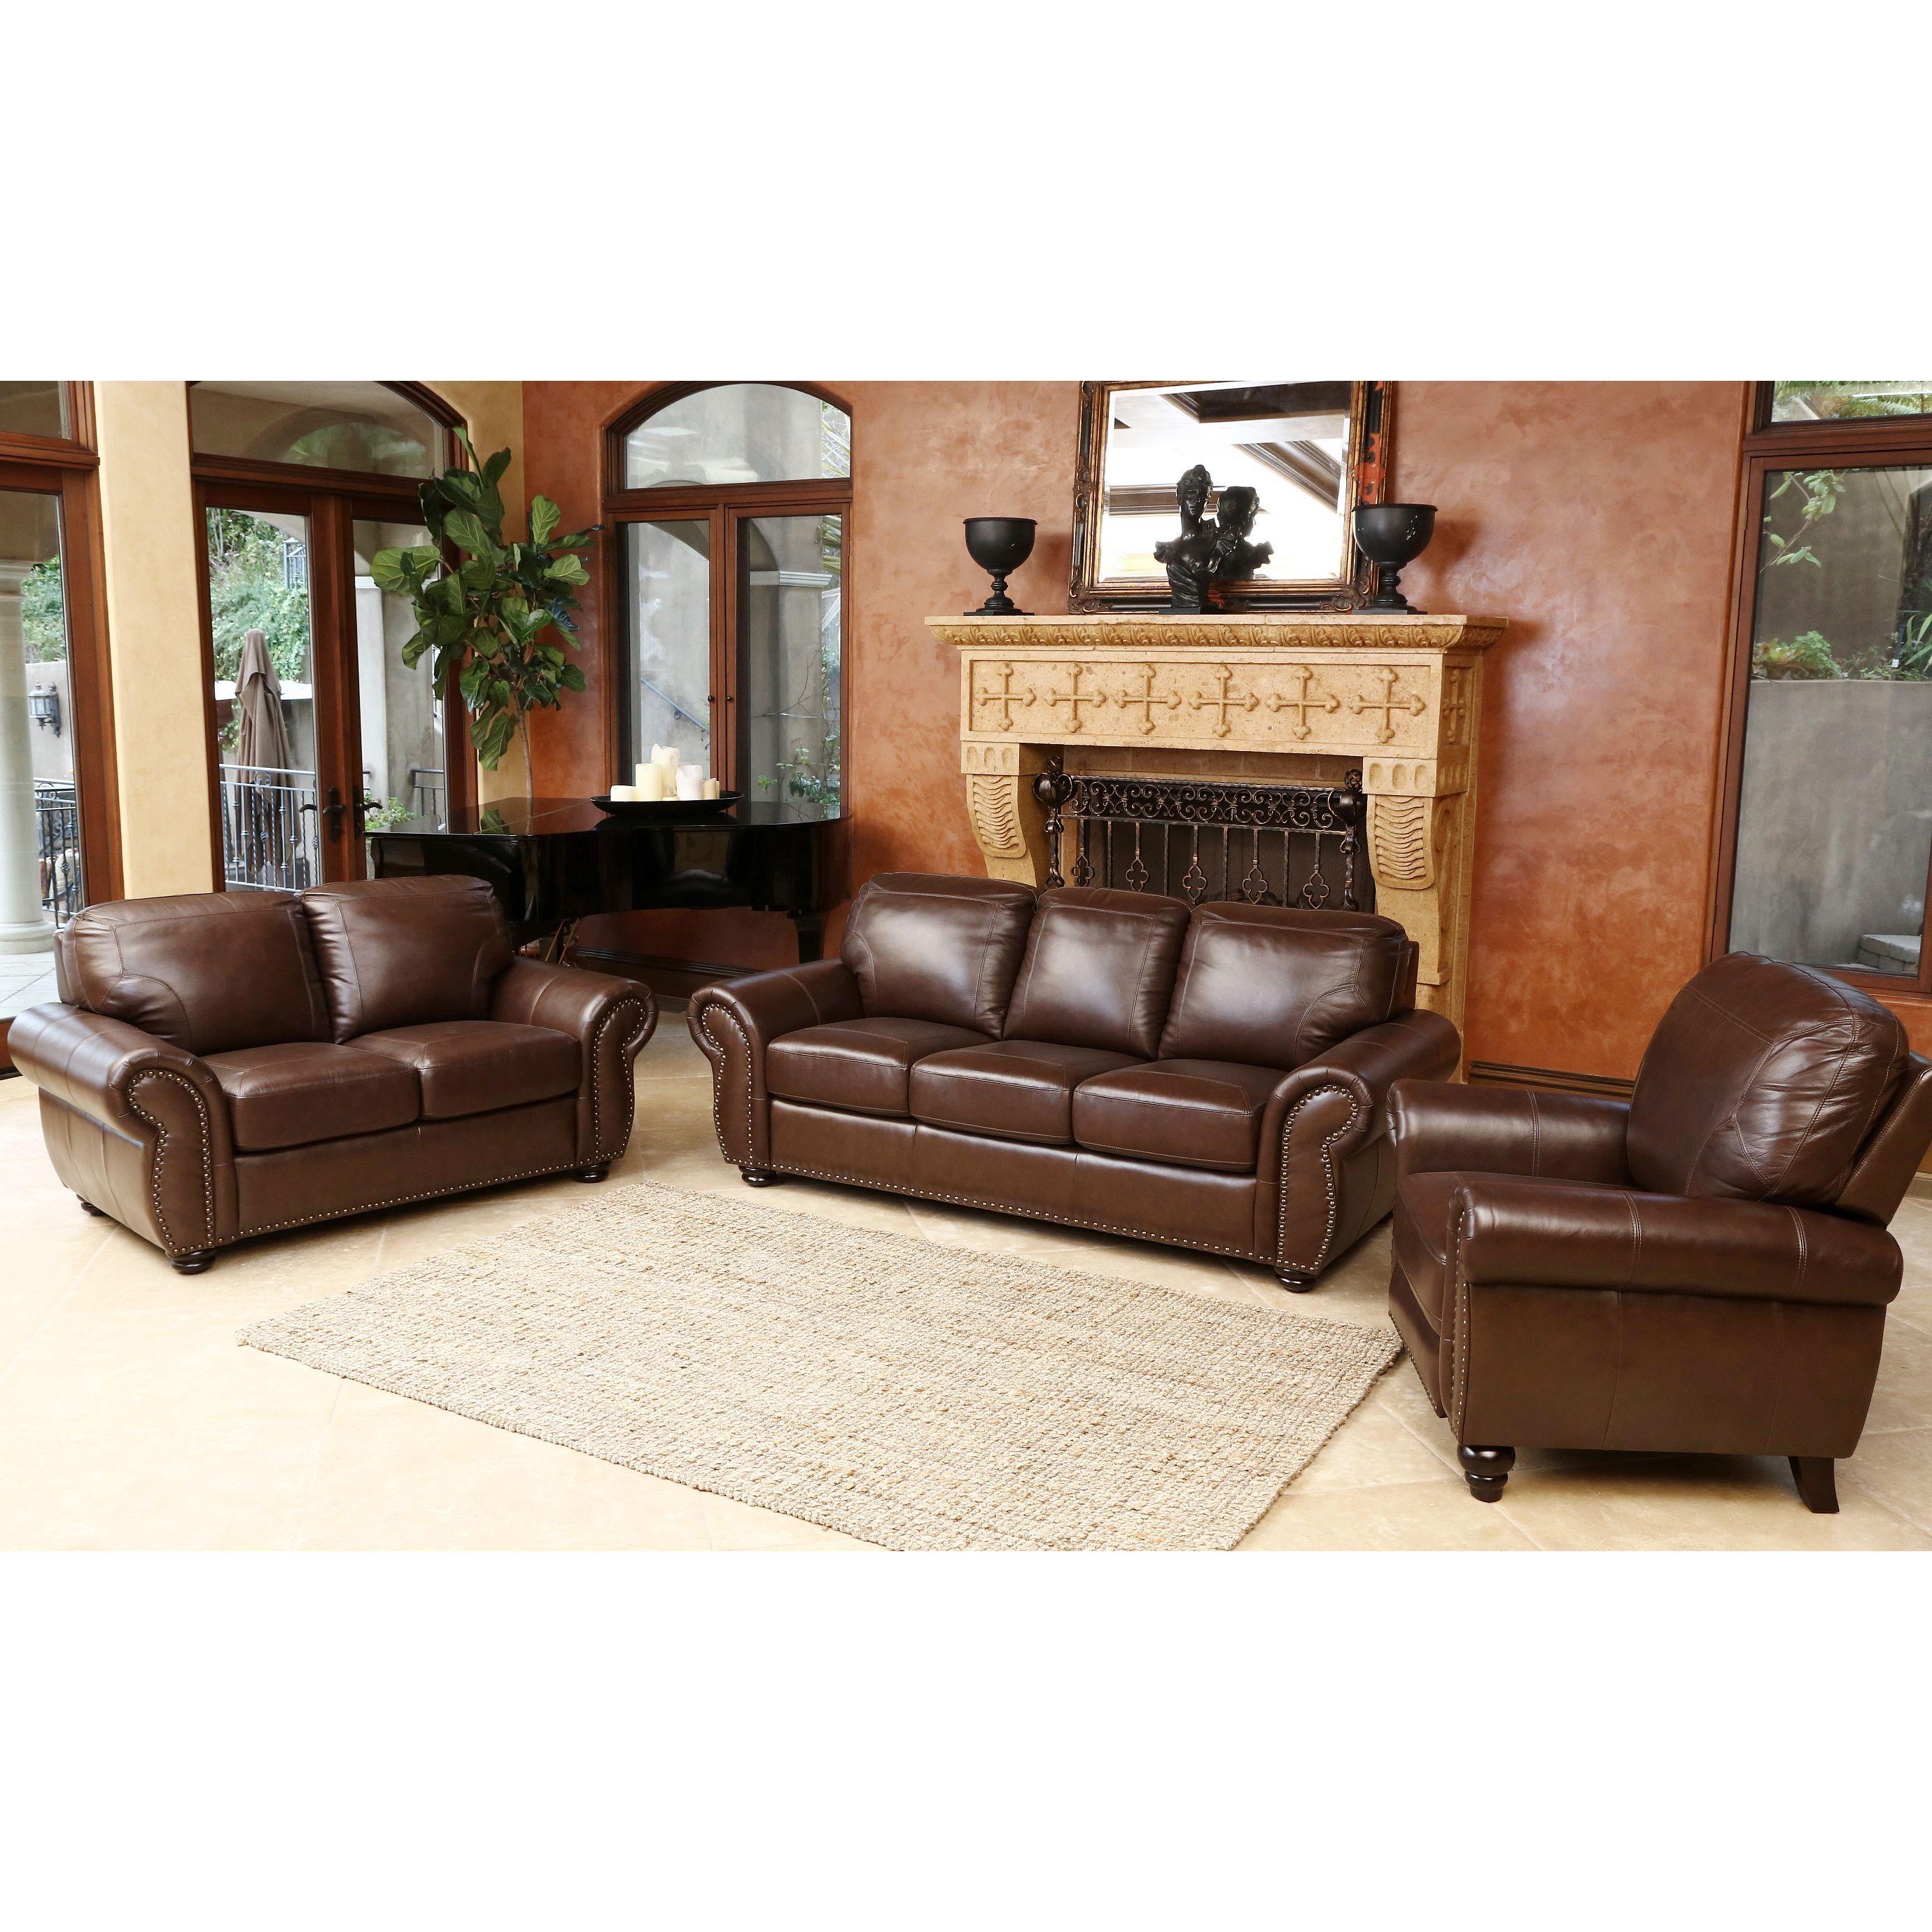 Abbyson Bellavista 3 piece Top Grain Leather Sofa Loveseat